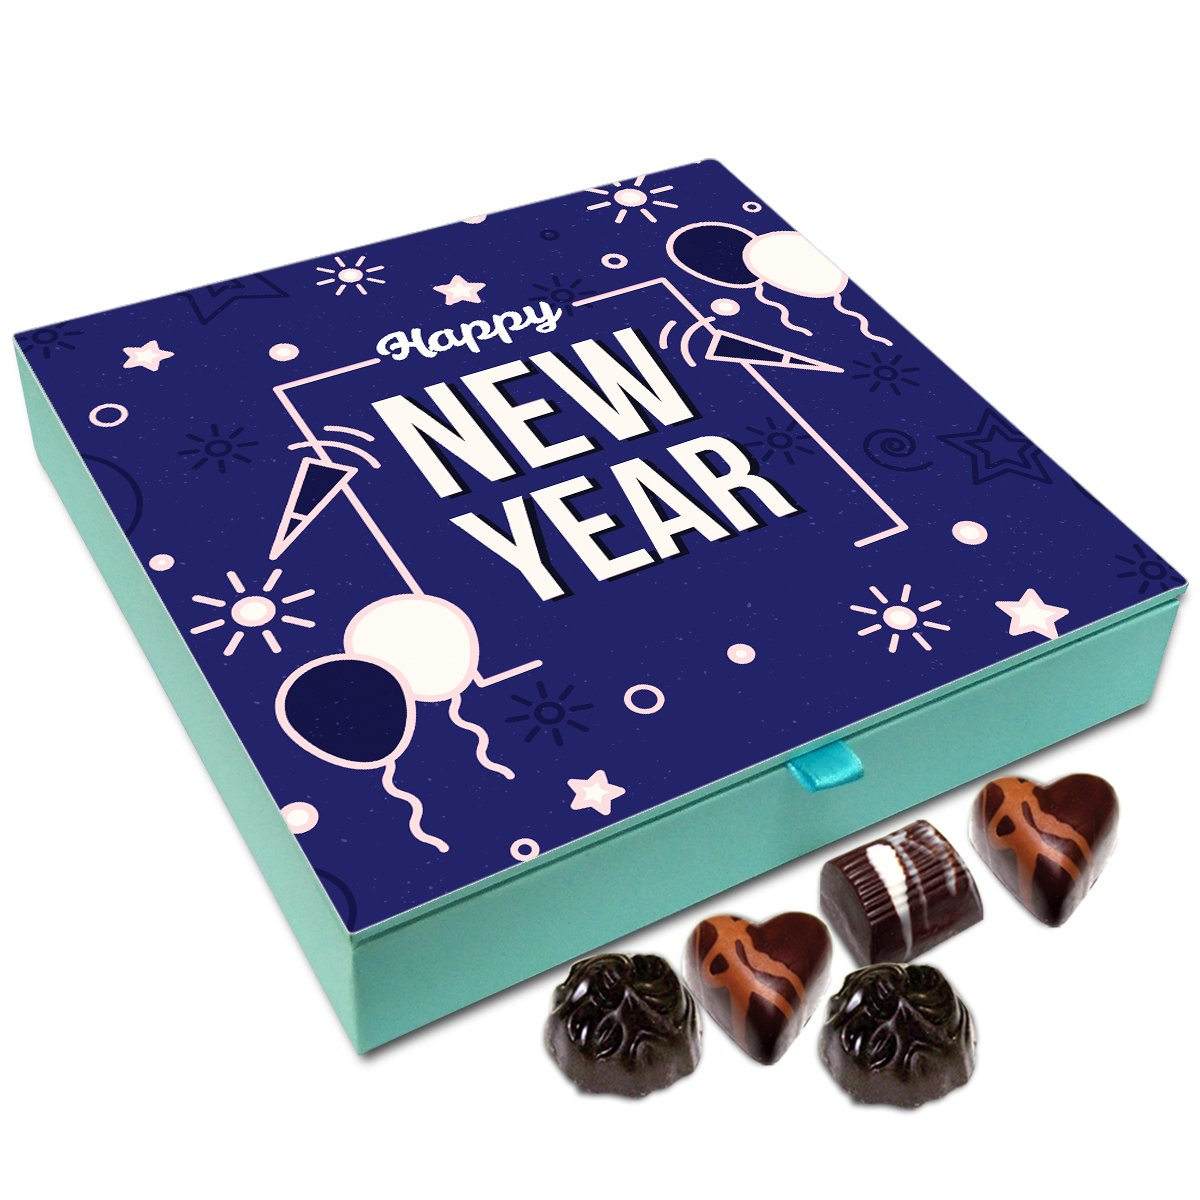 Chocholik New Year Gift Box – Happy New Year to All Chocolate Box – 9pc